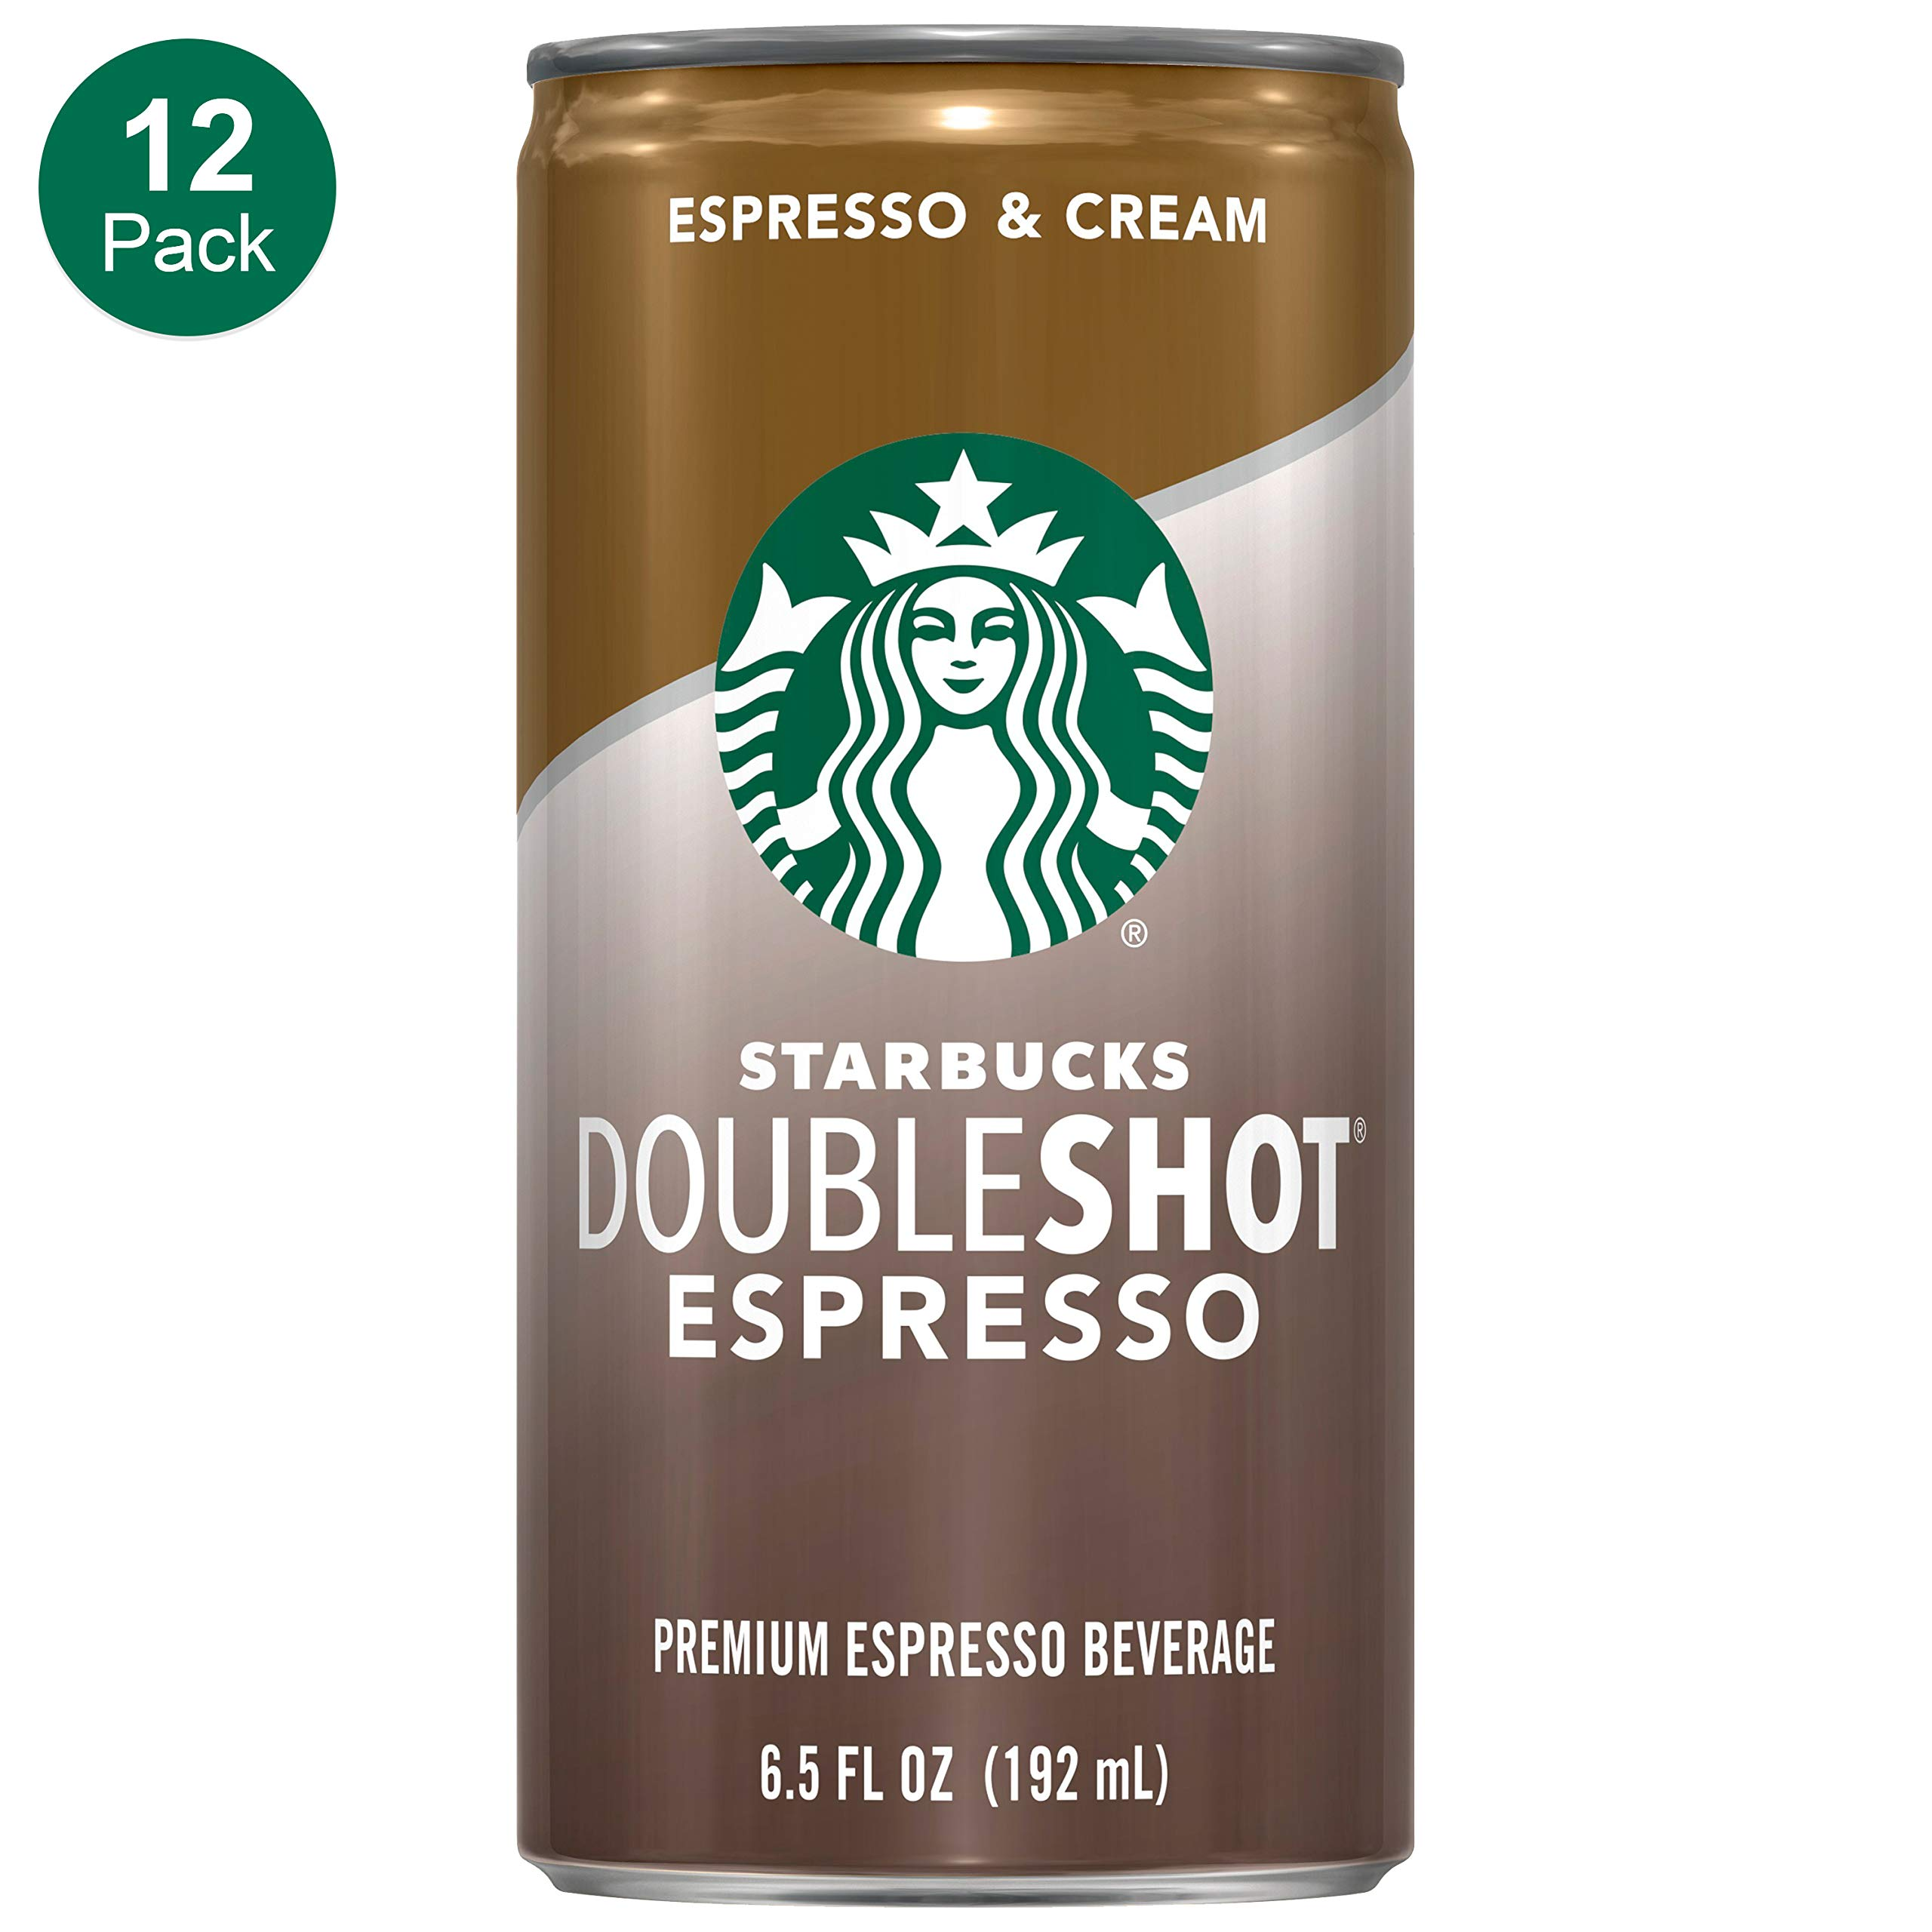 Starbucks Doubleshot, Espresso + Cream, 6.5 Fluid Ounce, Pack of 12 by Starbucks